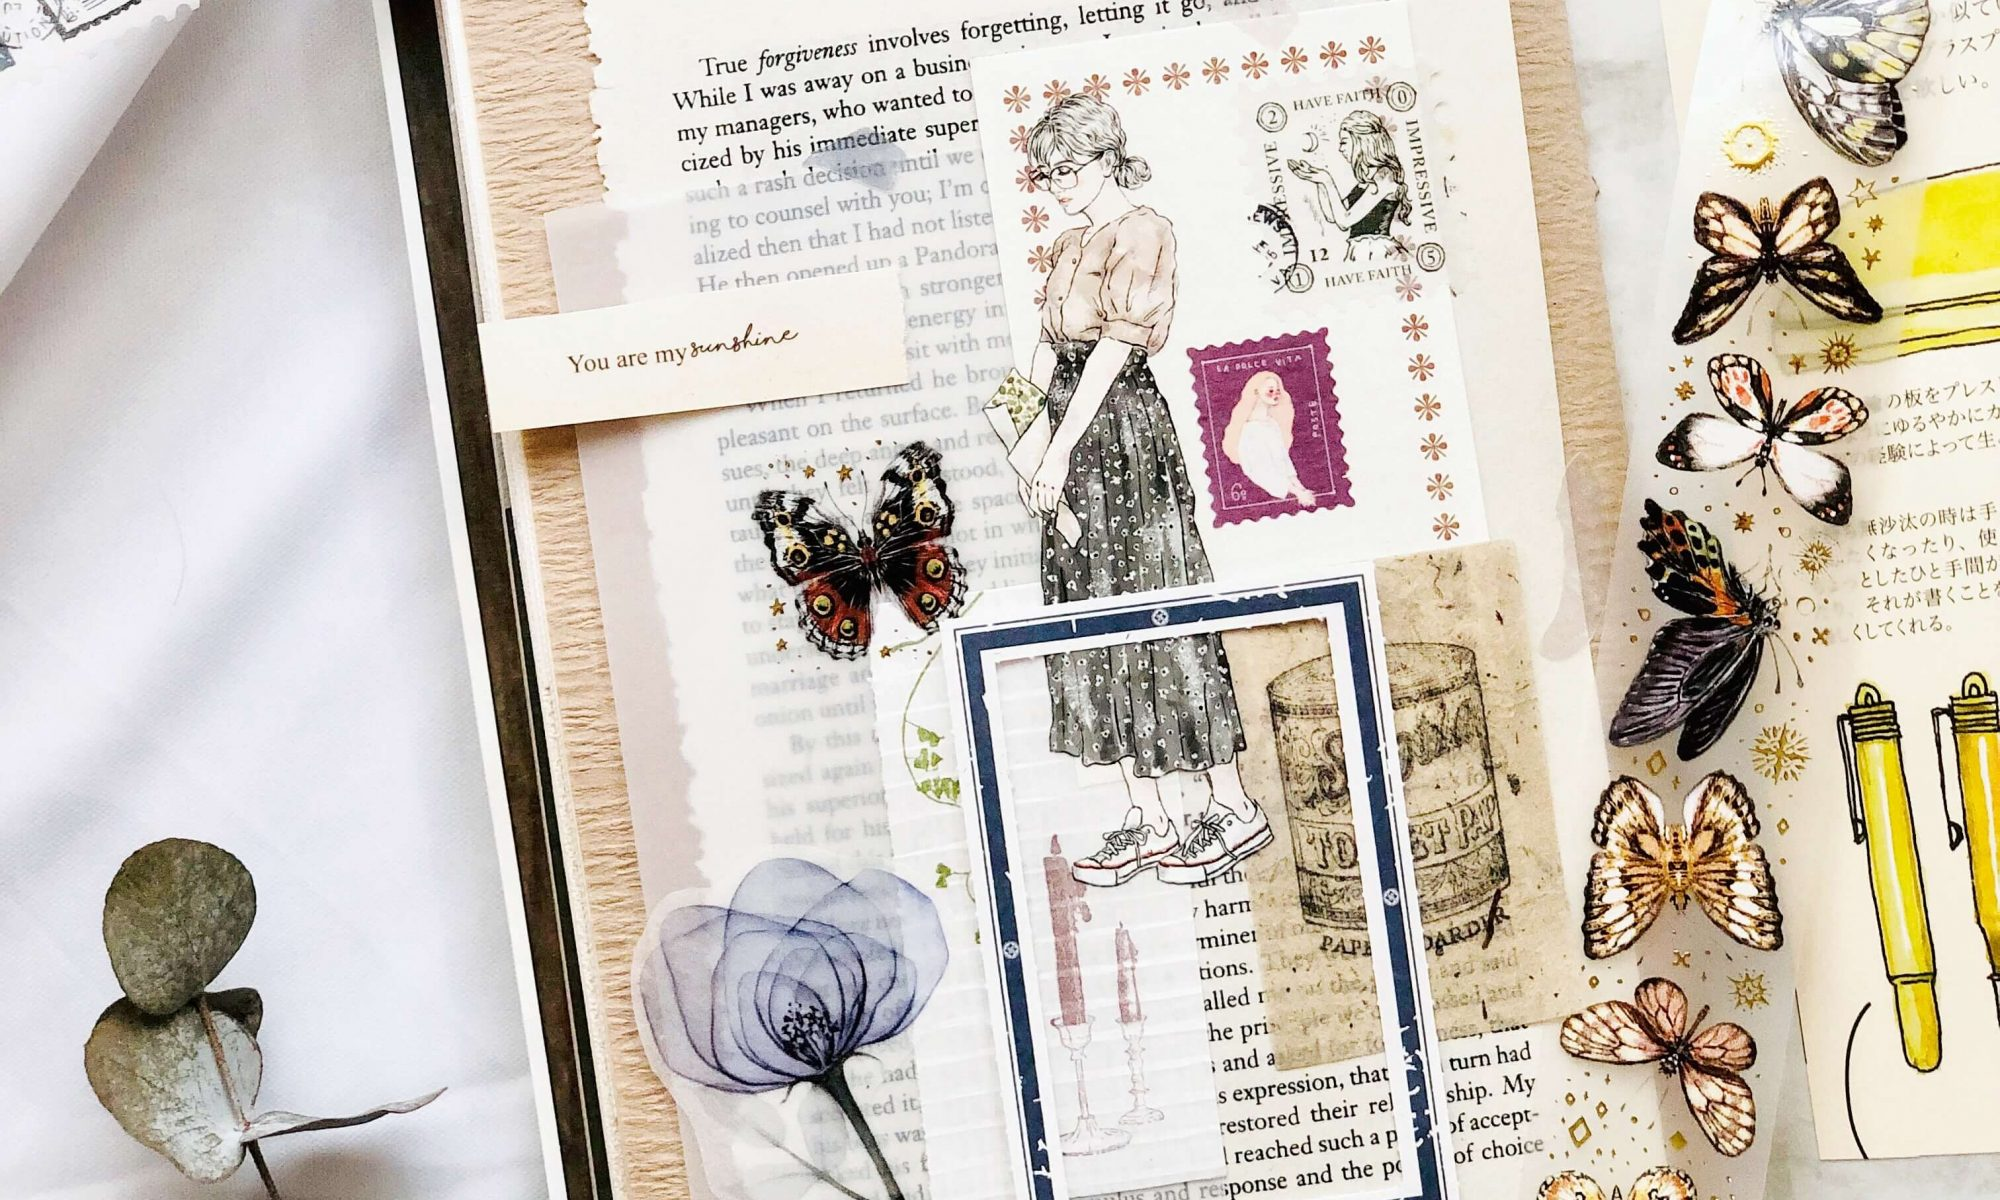 Taiwan Pion Girl Sticker Tape She Aesthetic Girl Sticker Hand Drawing Modern Girl Sticker Tape Art Journal